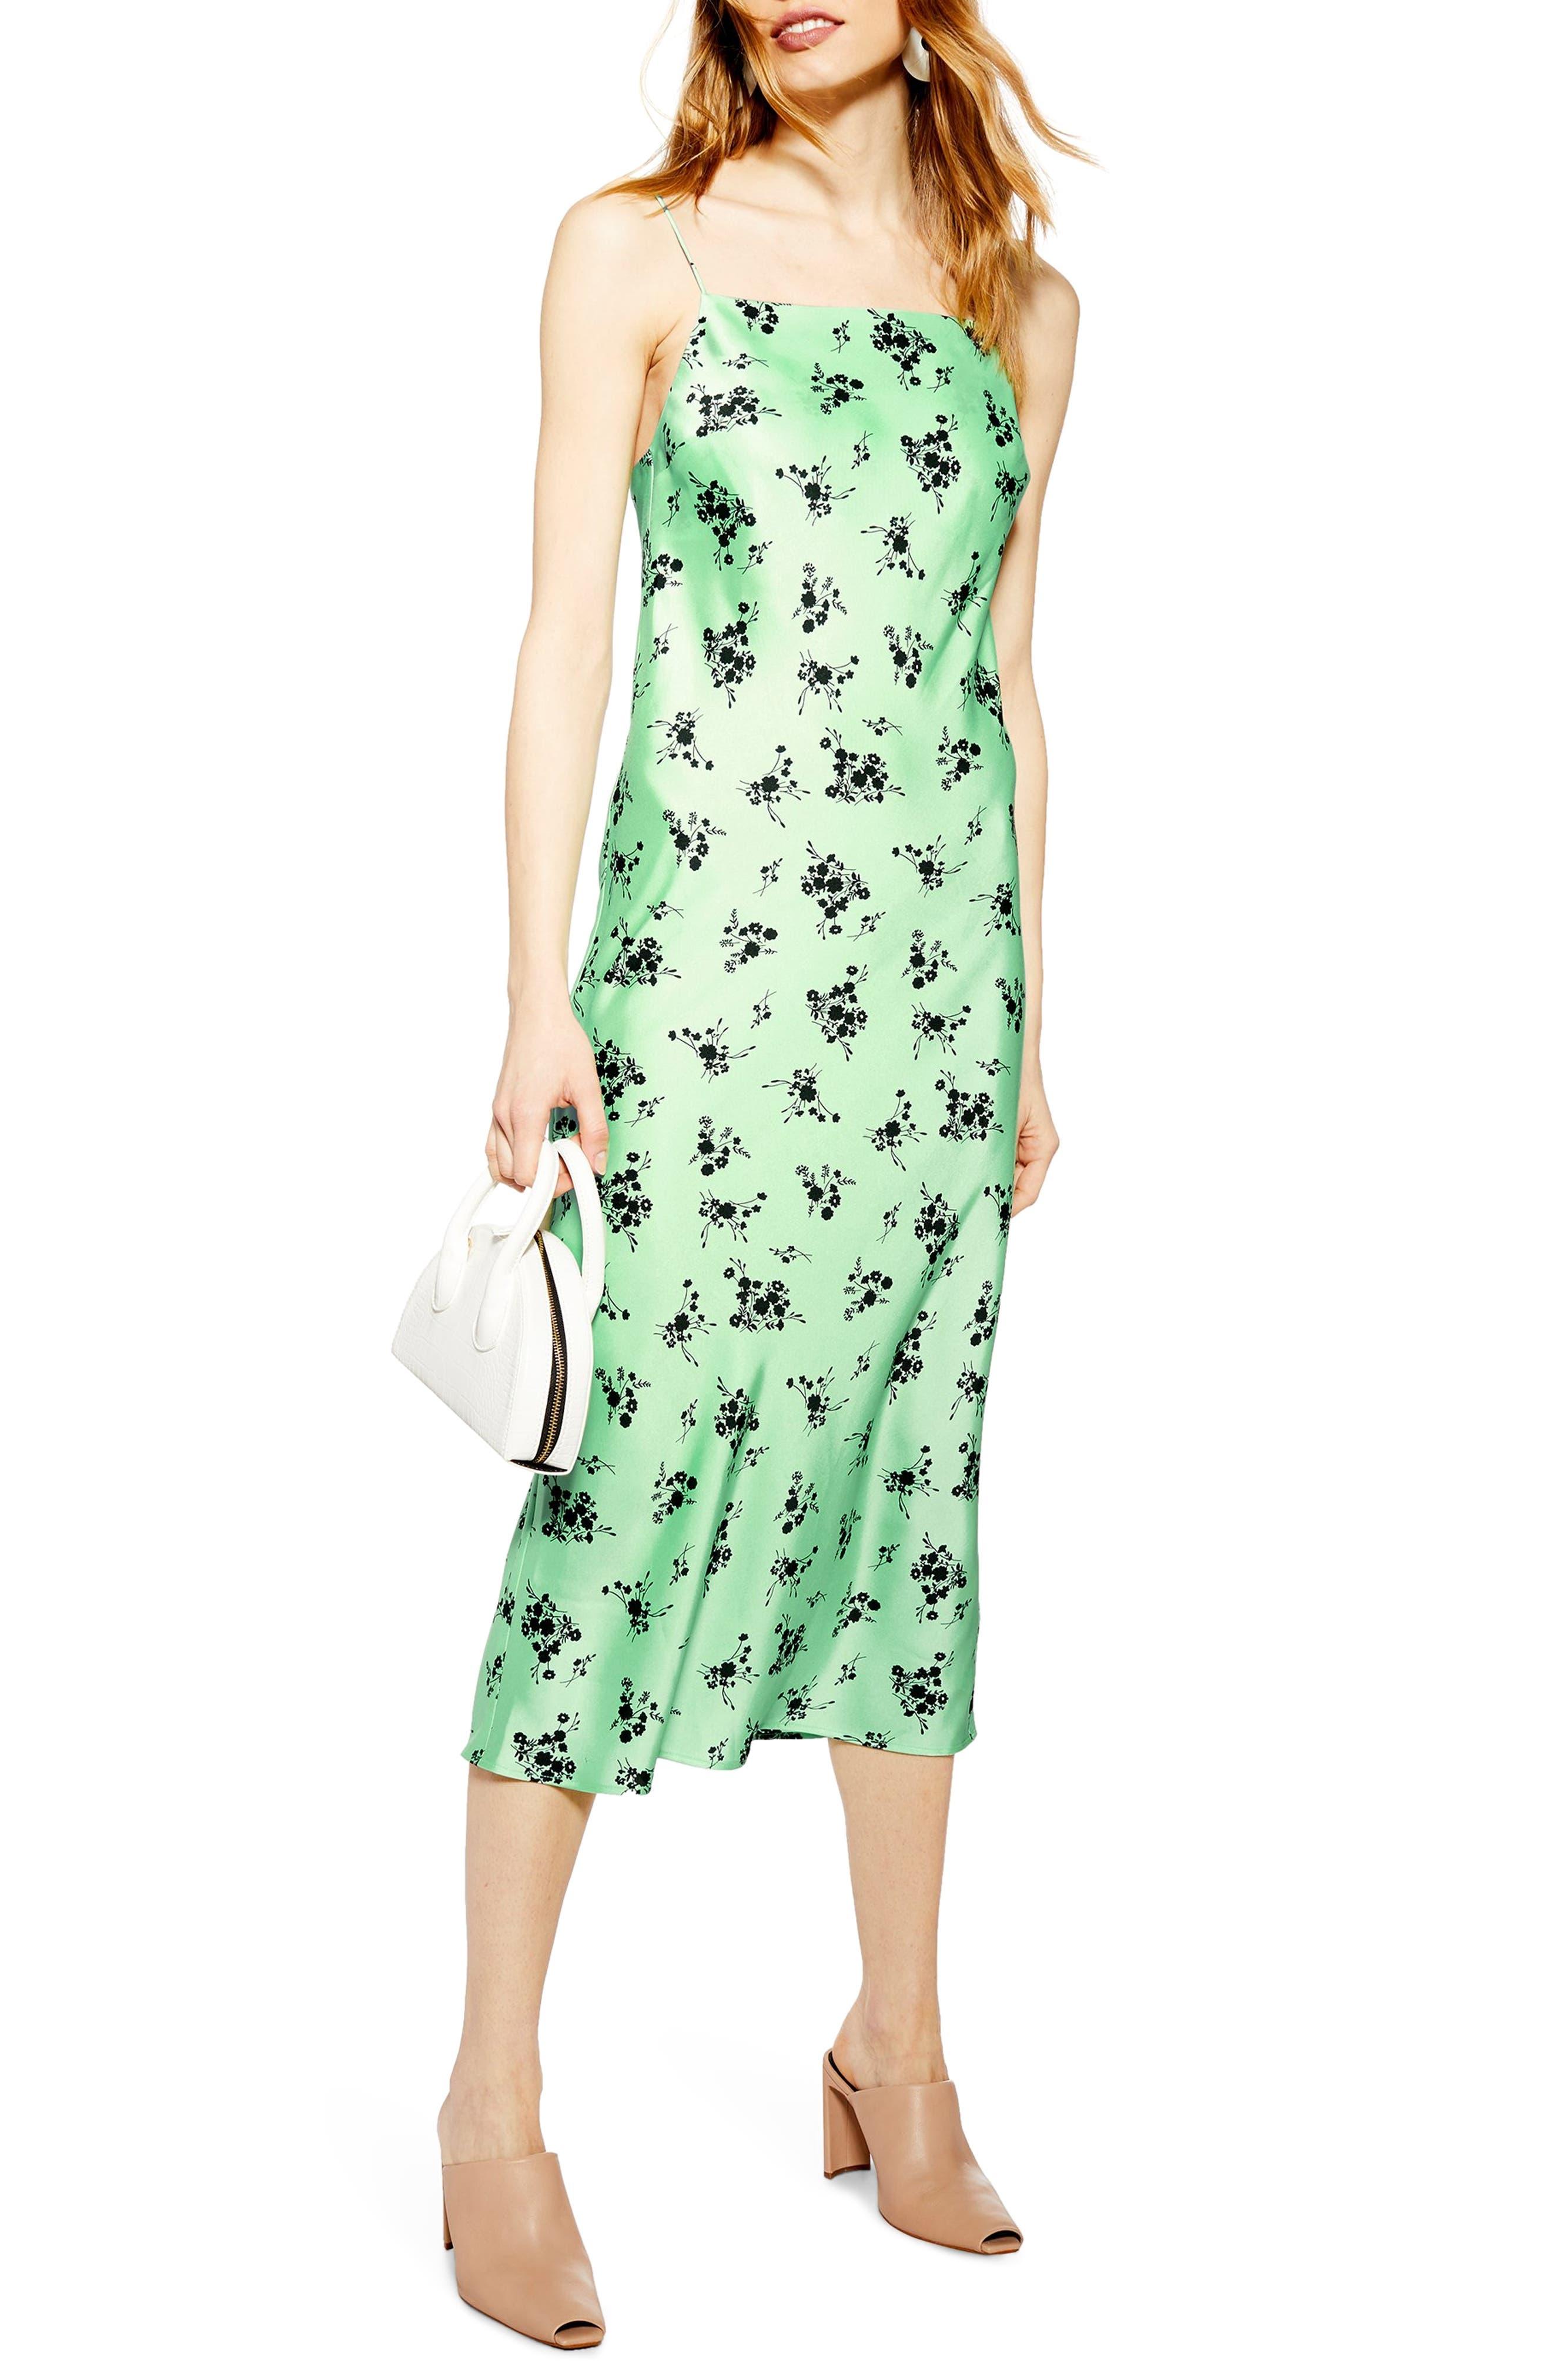 Topshop Apple Flower Satin Slip Dress, US (fits like 0-2) - Green